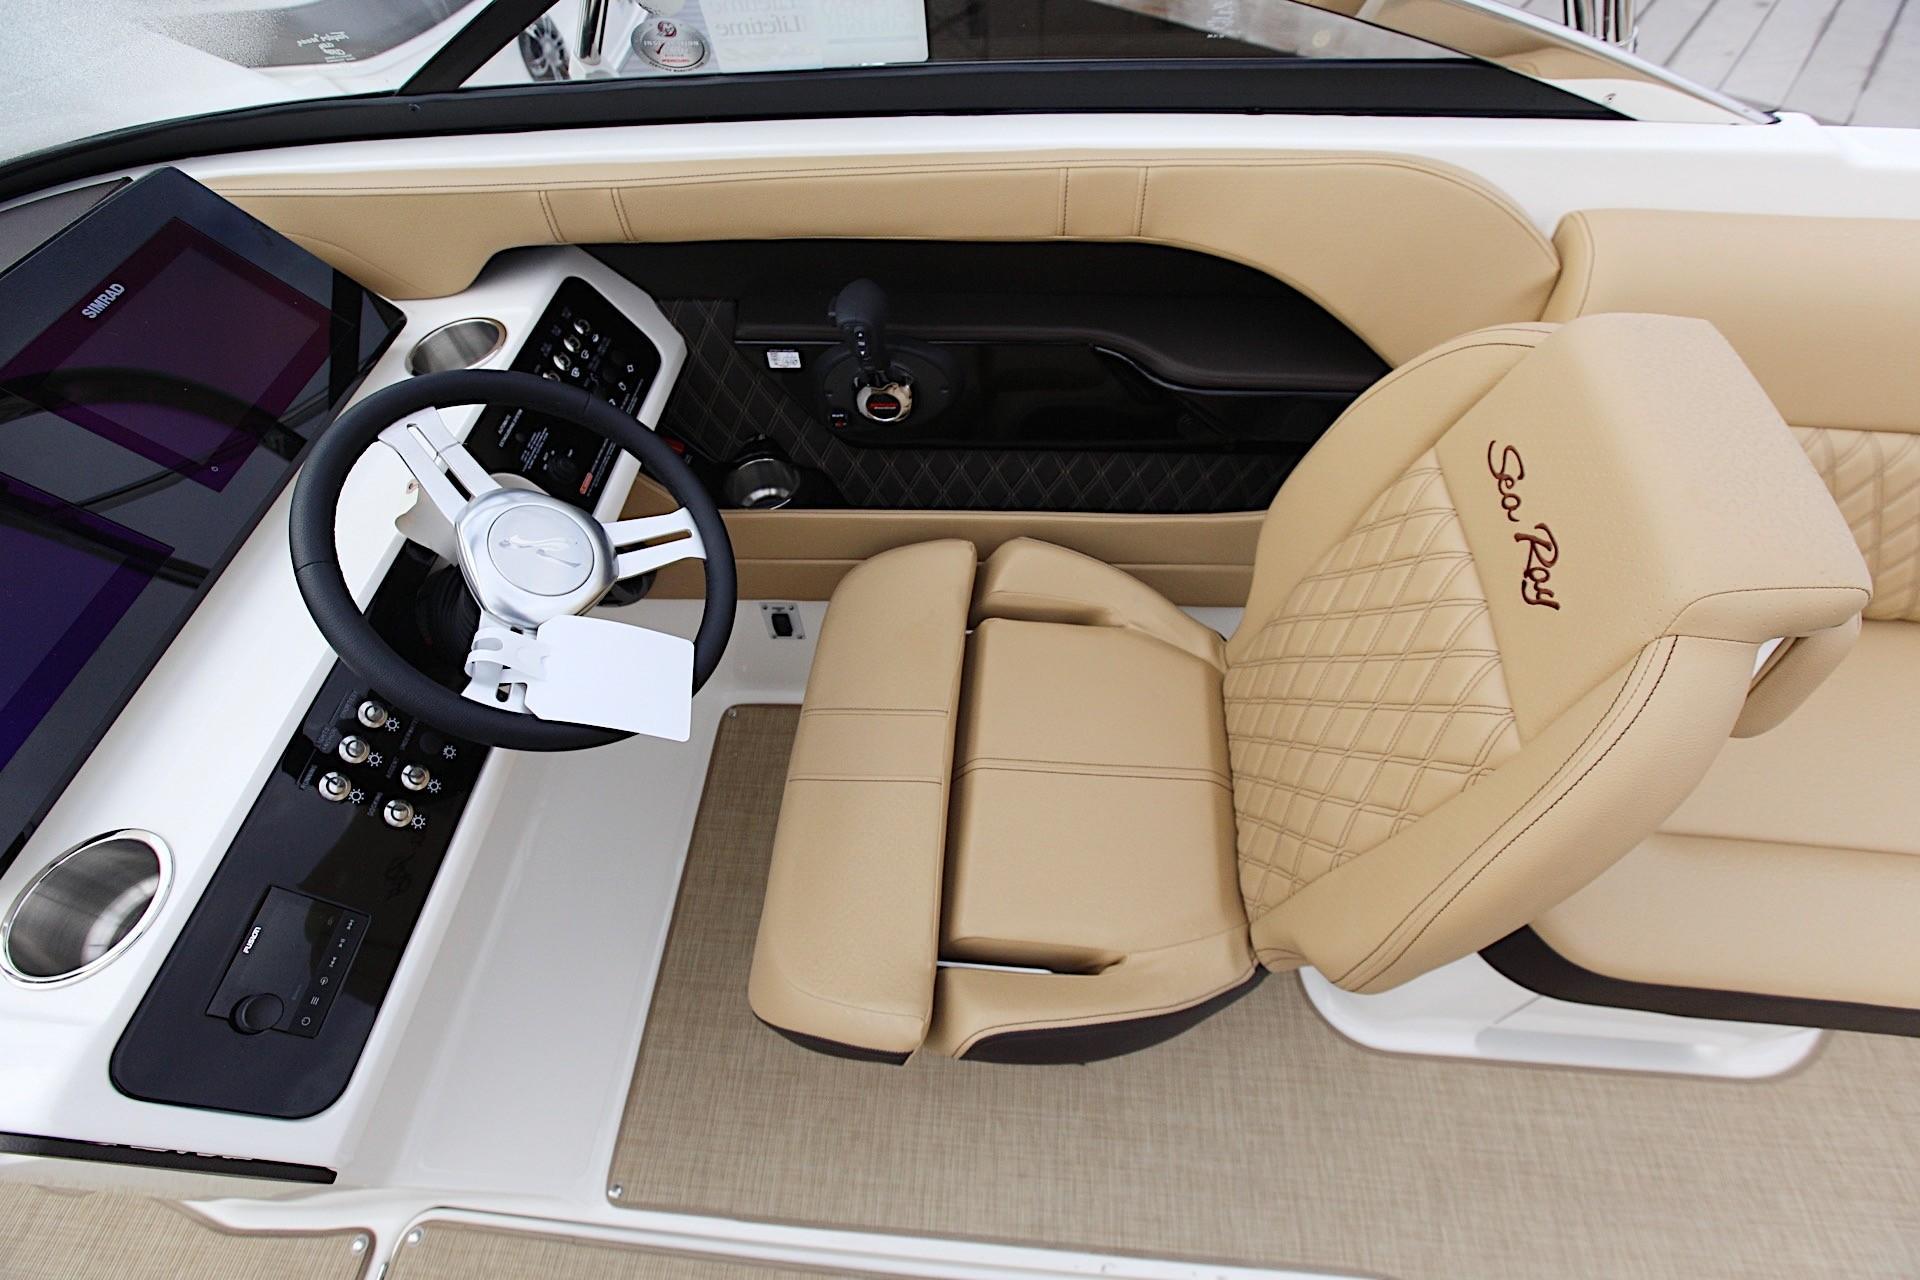 2020 Sea Ray SLX 230 #S1408I inventory image at Sun Country Coastal in Newport Beach